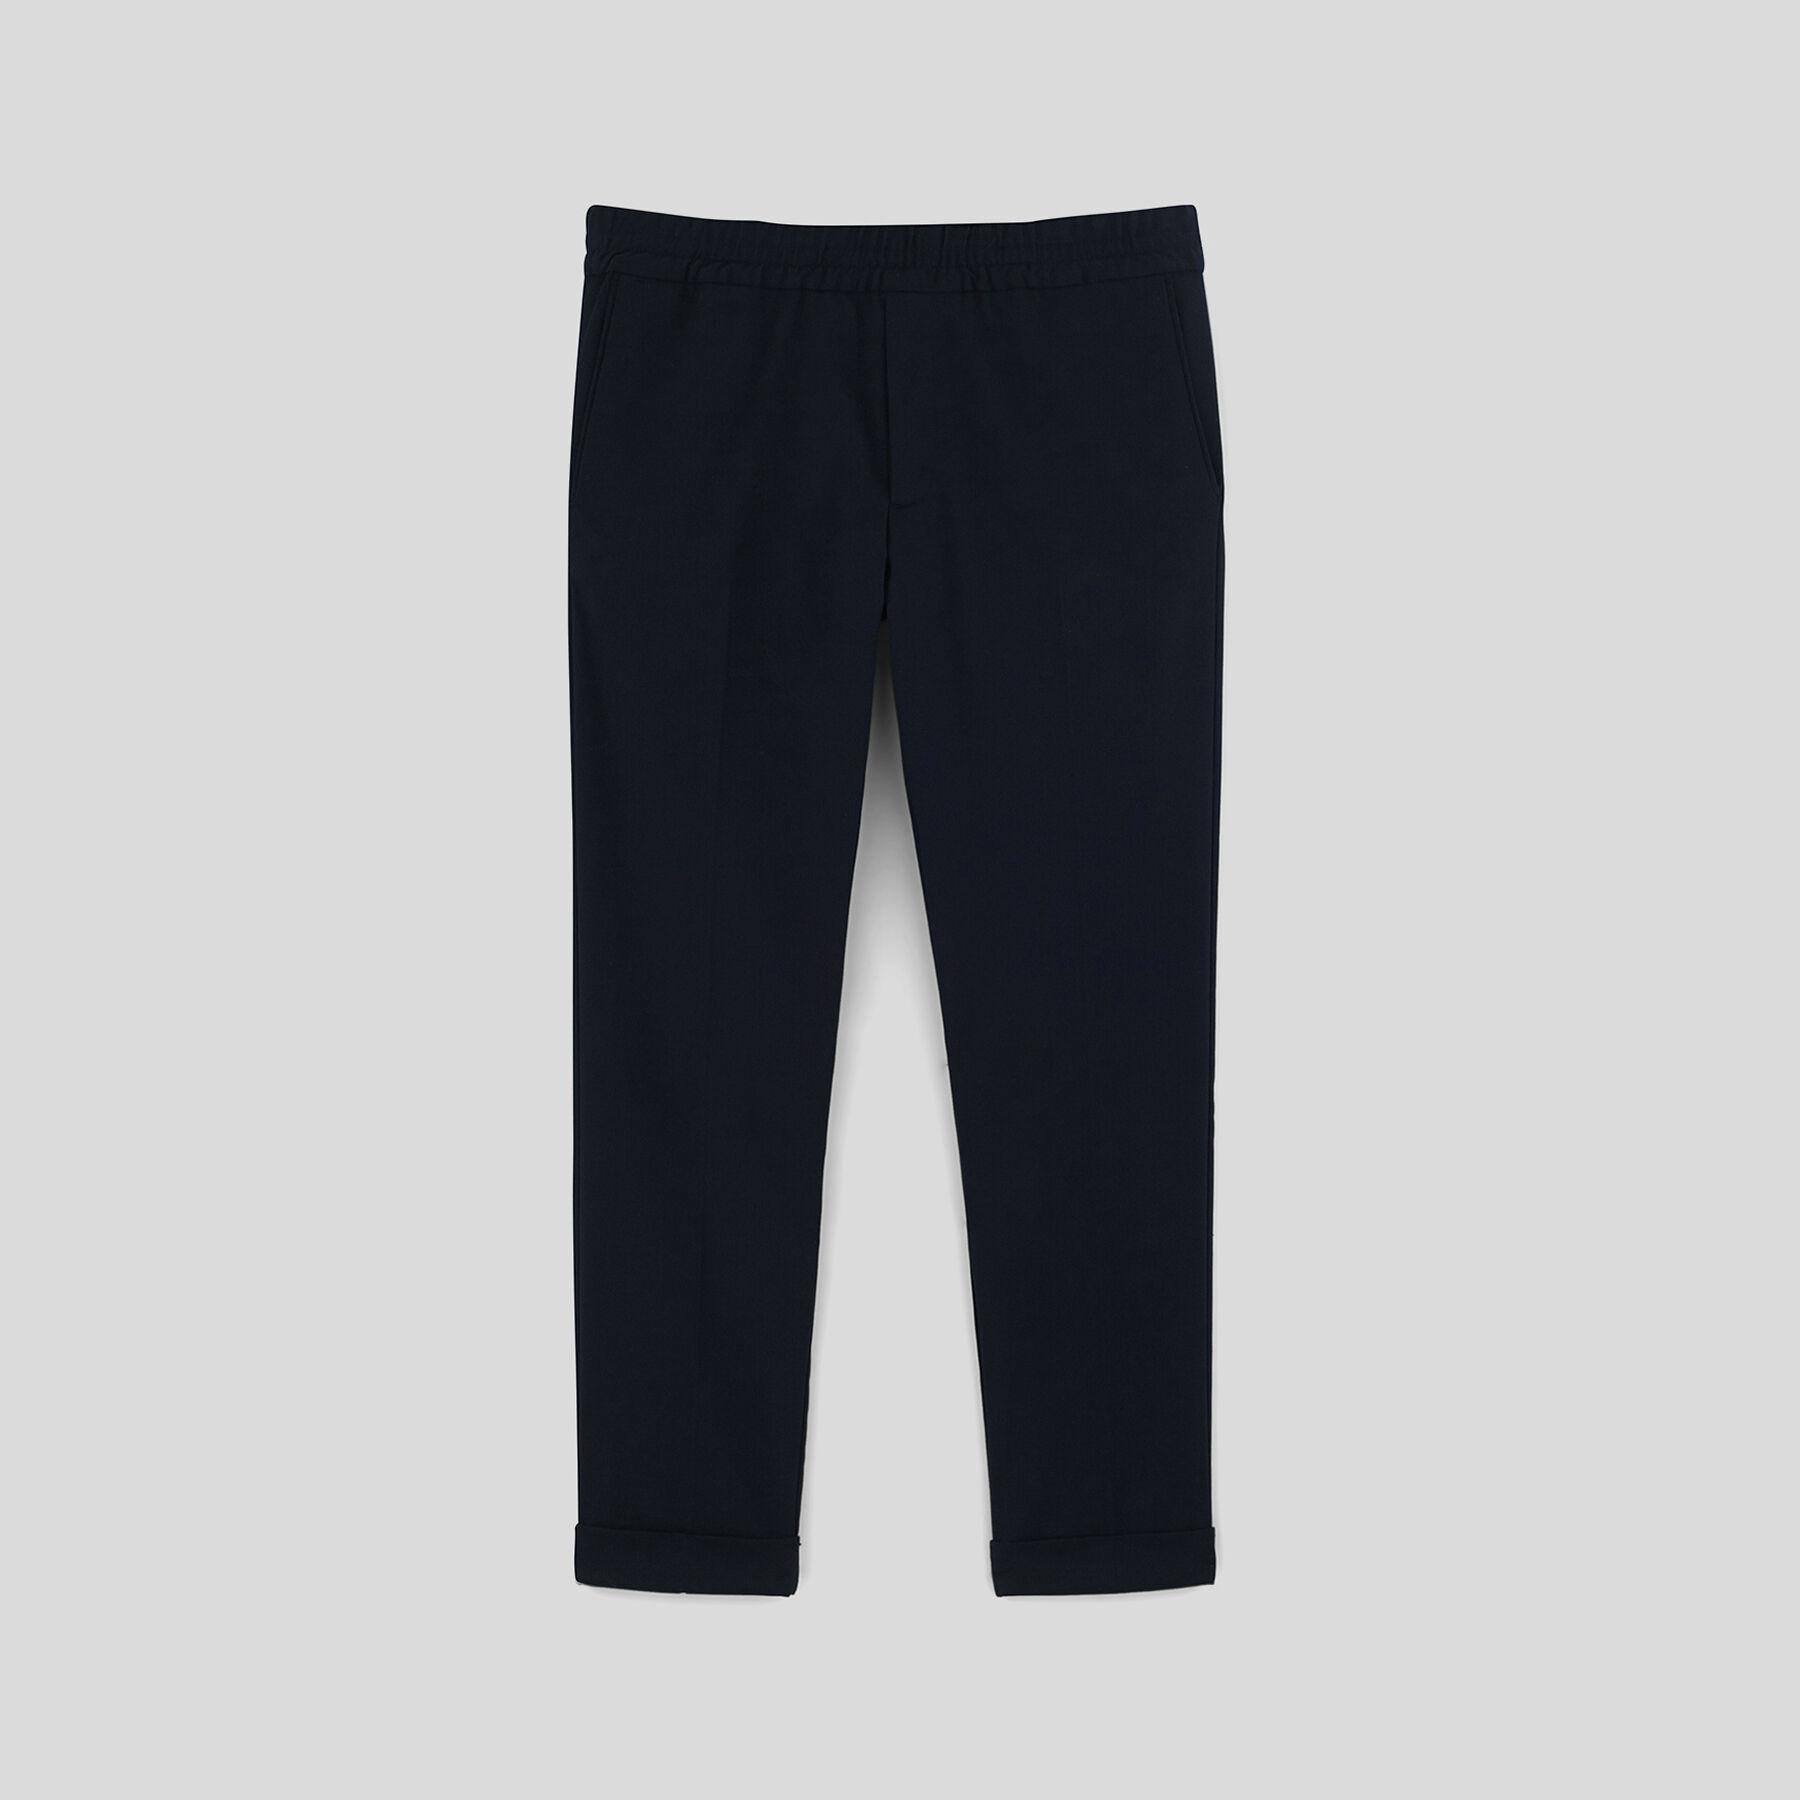 pantalon taille lastiqu bleu marine homme jules. Black Bedroom Furniture Sets. Home Design Ideas